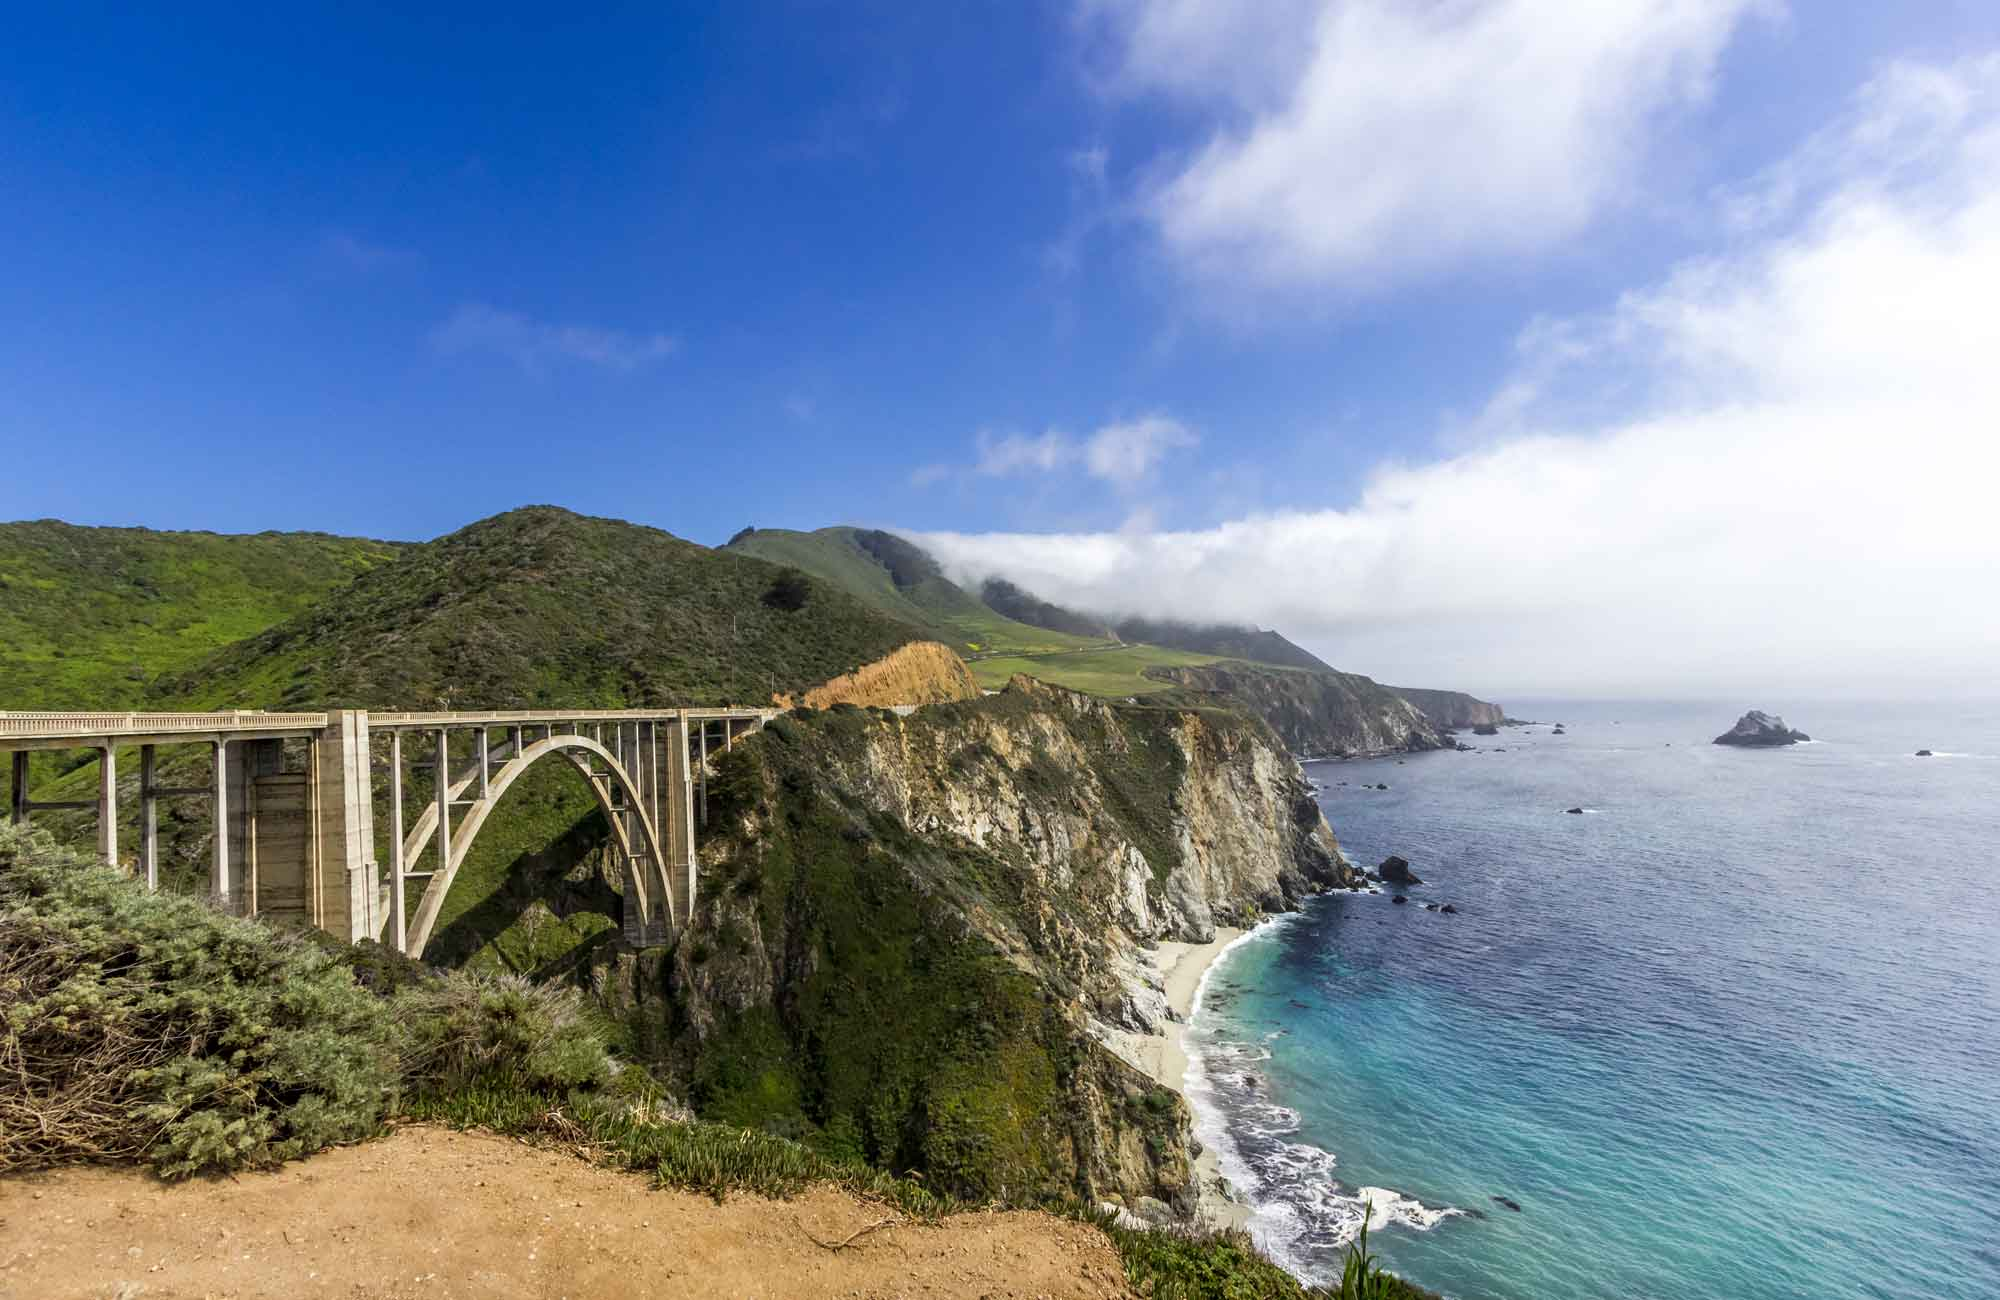 Voyage Etats-Unis - Bixby Bridge califonie-route-1 - Amplitudes